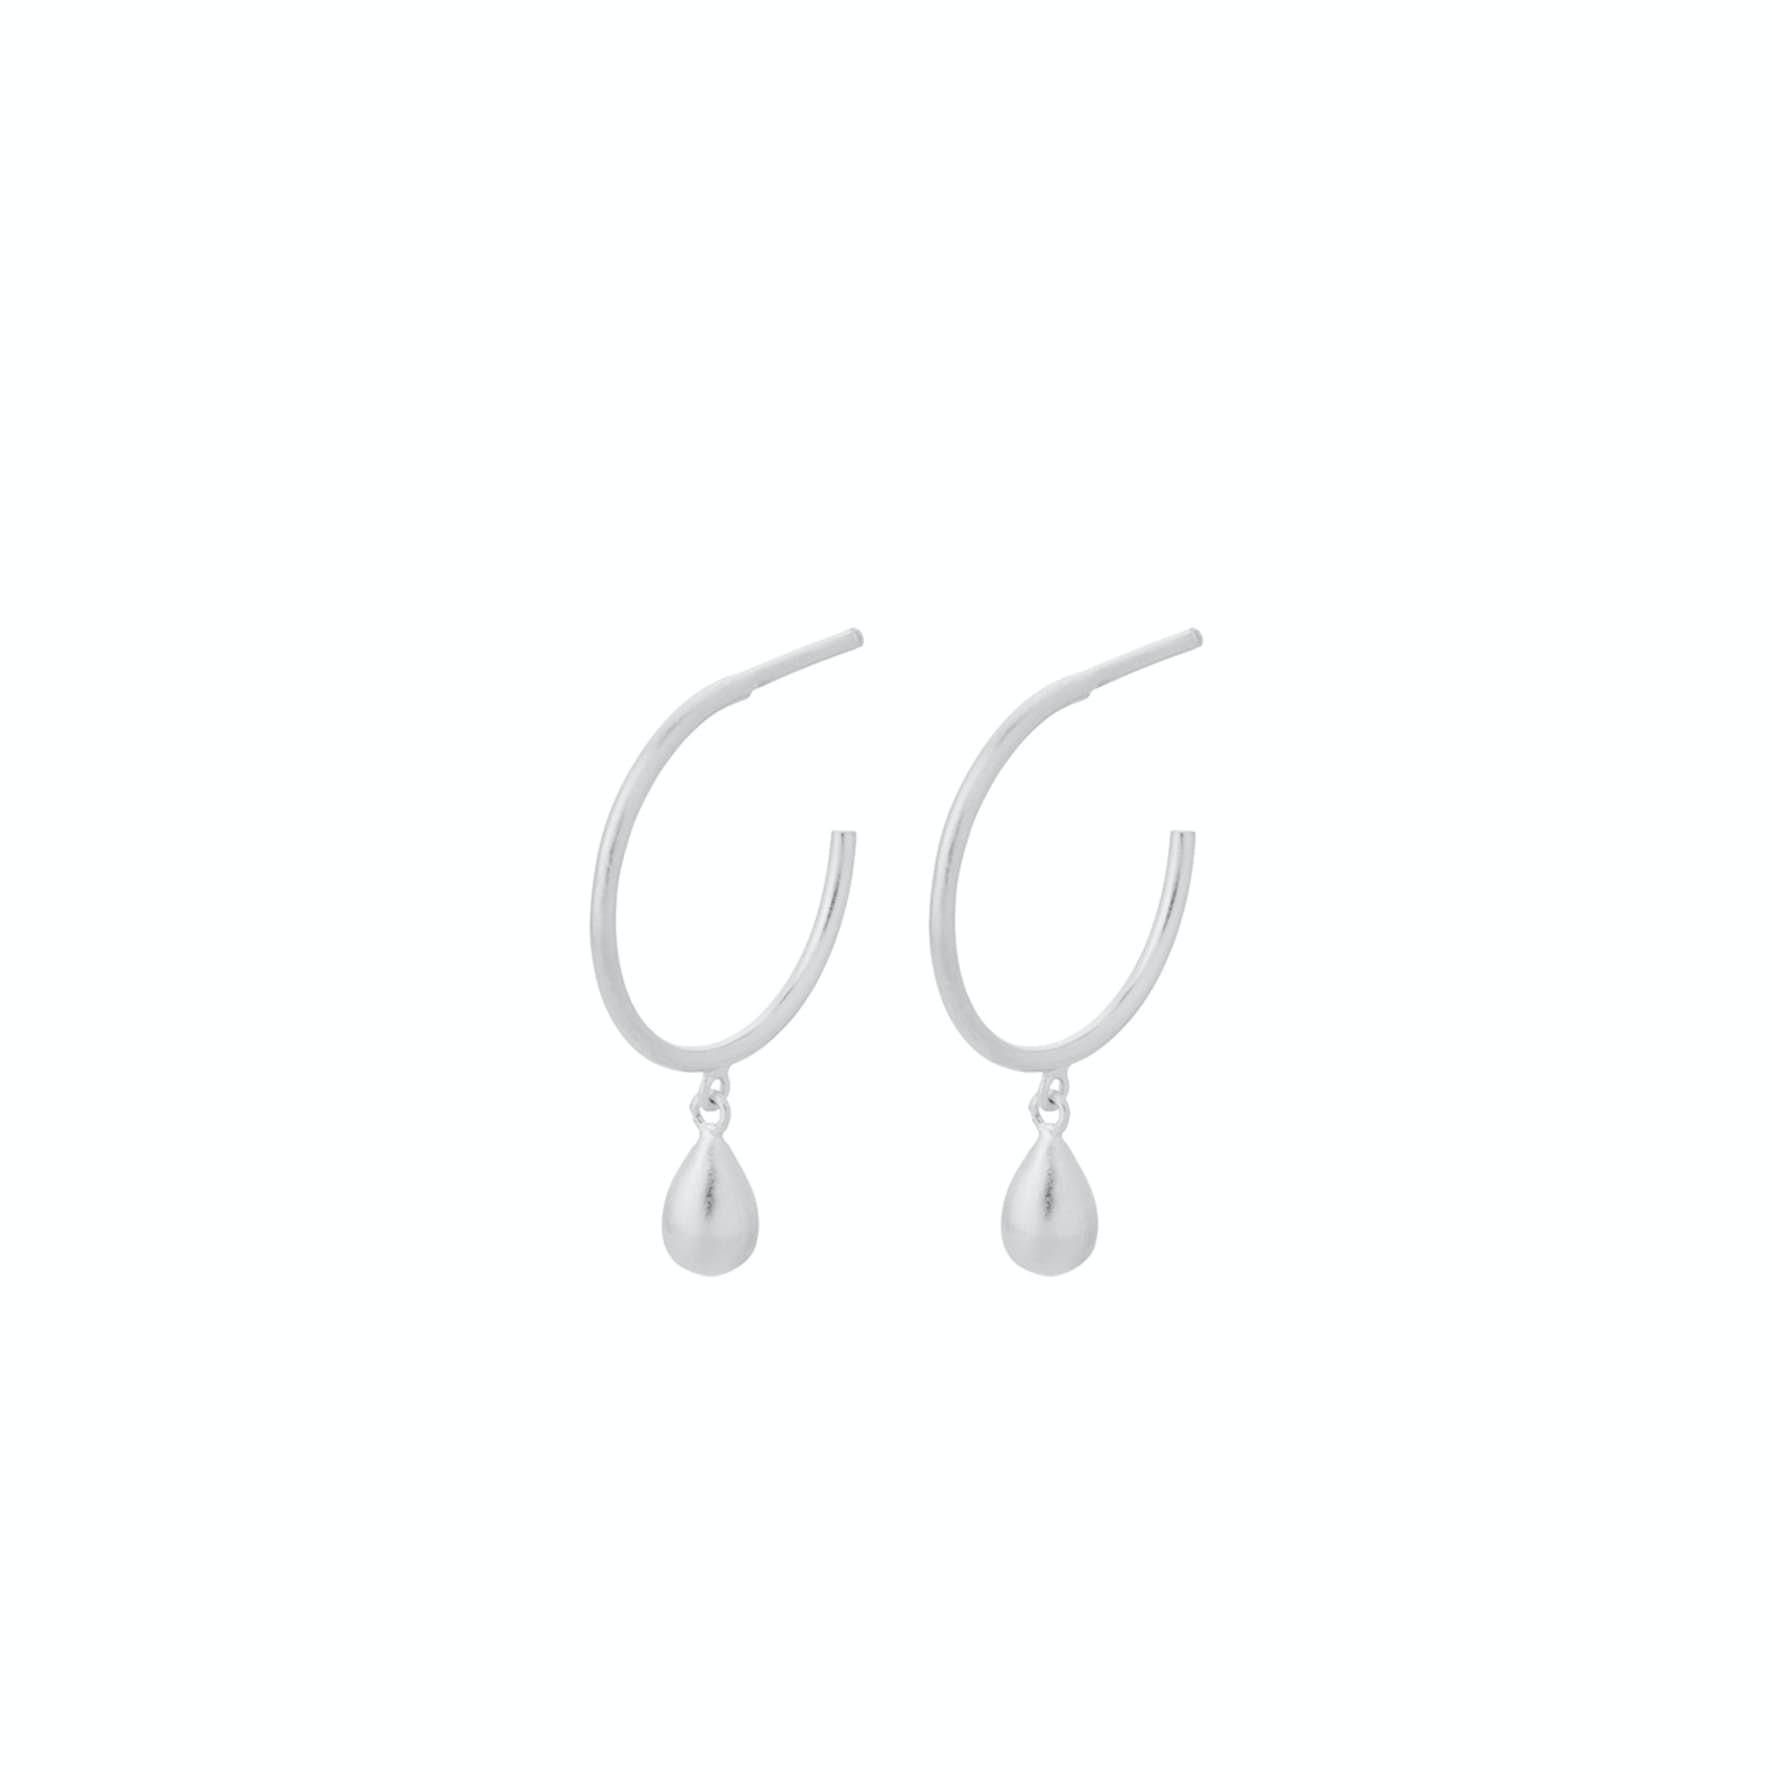 Waterdrop Hoops von Pernille Corydon in Silber Sterling 925